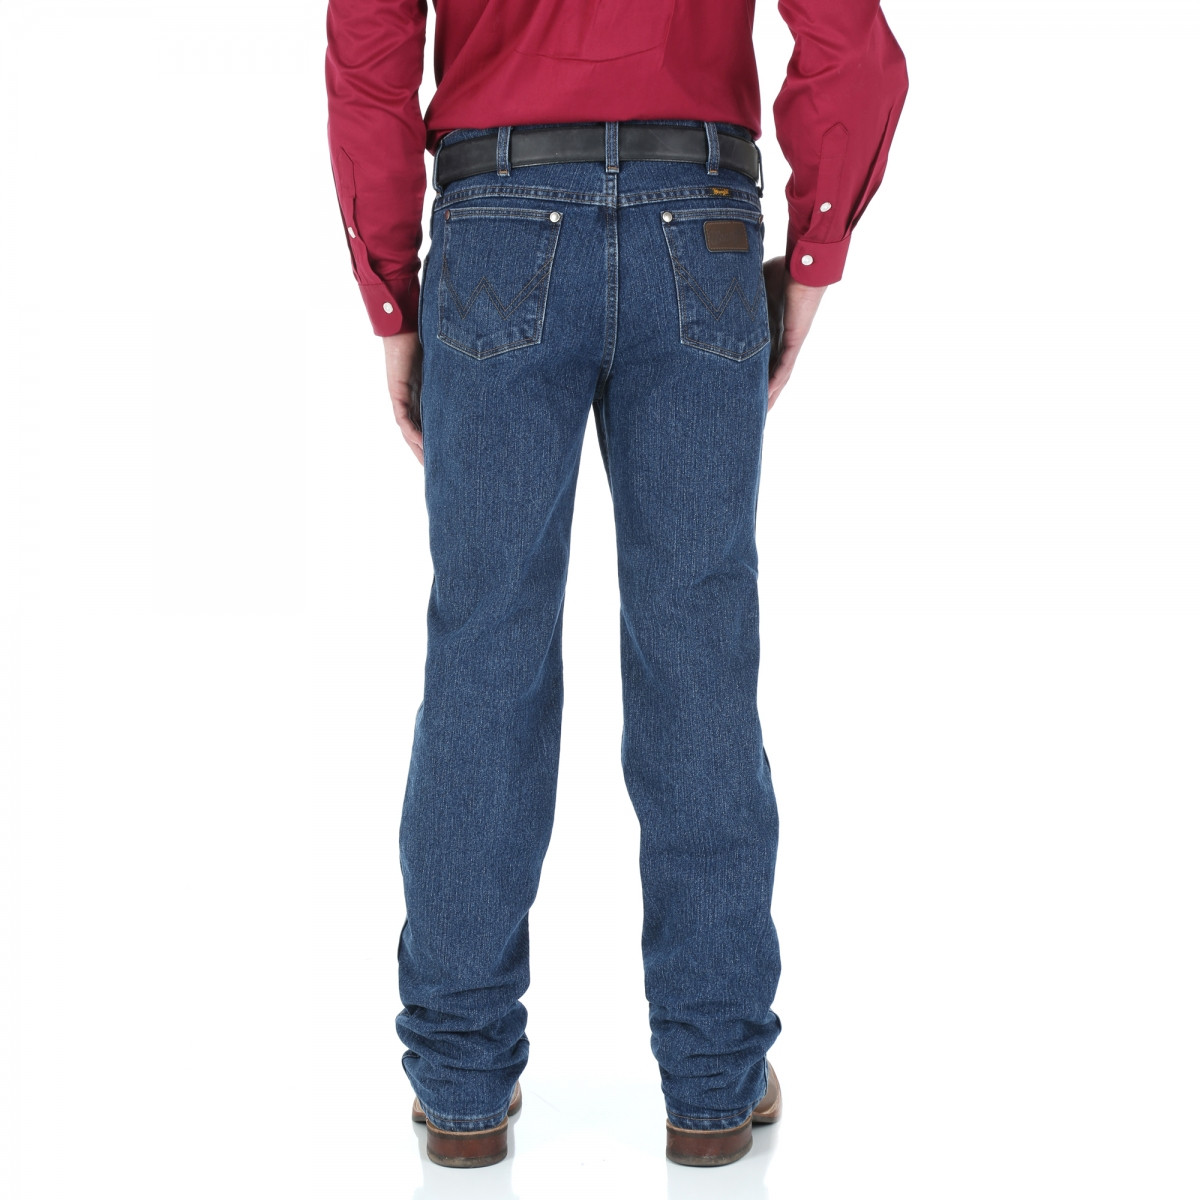 c624a410 ... Wrangler Premium Performance Advanced Comfort Cowboy Cut Slim Fit Mid  Stone. Image 1 · Image 1 · Image 2 ...